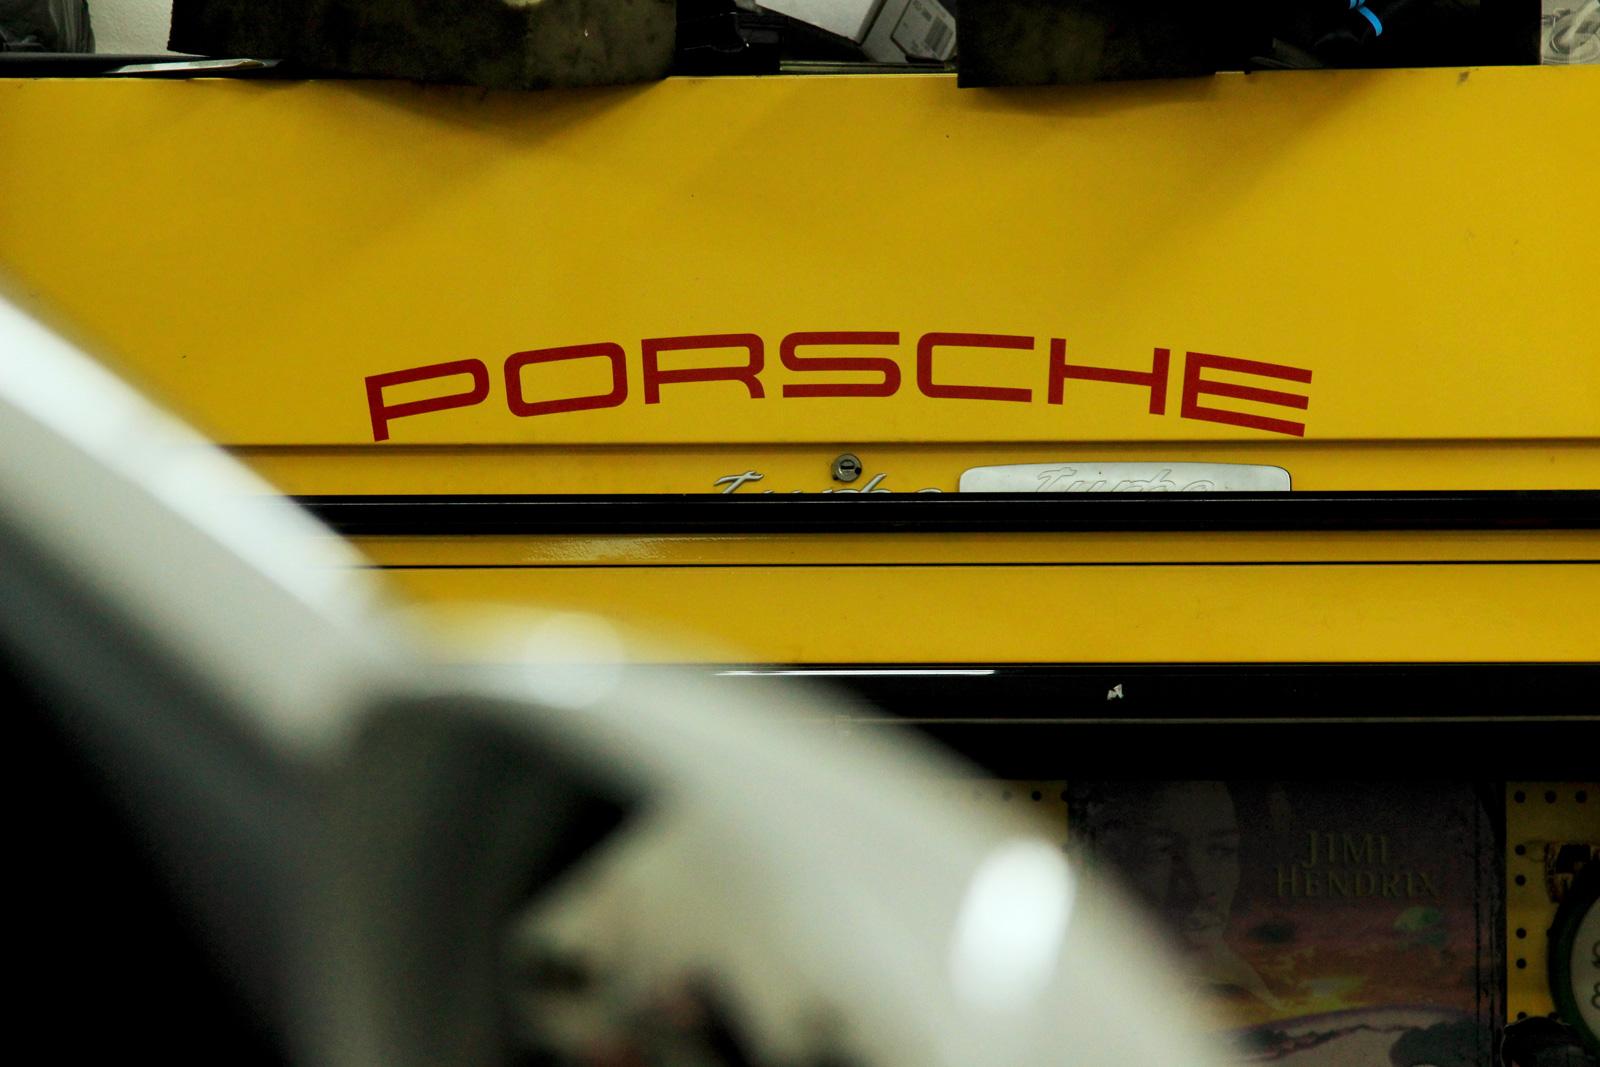 Akers Porsche Porsche Audi And VW We Do Auto Repair General - Porsche repair seattle